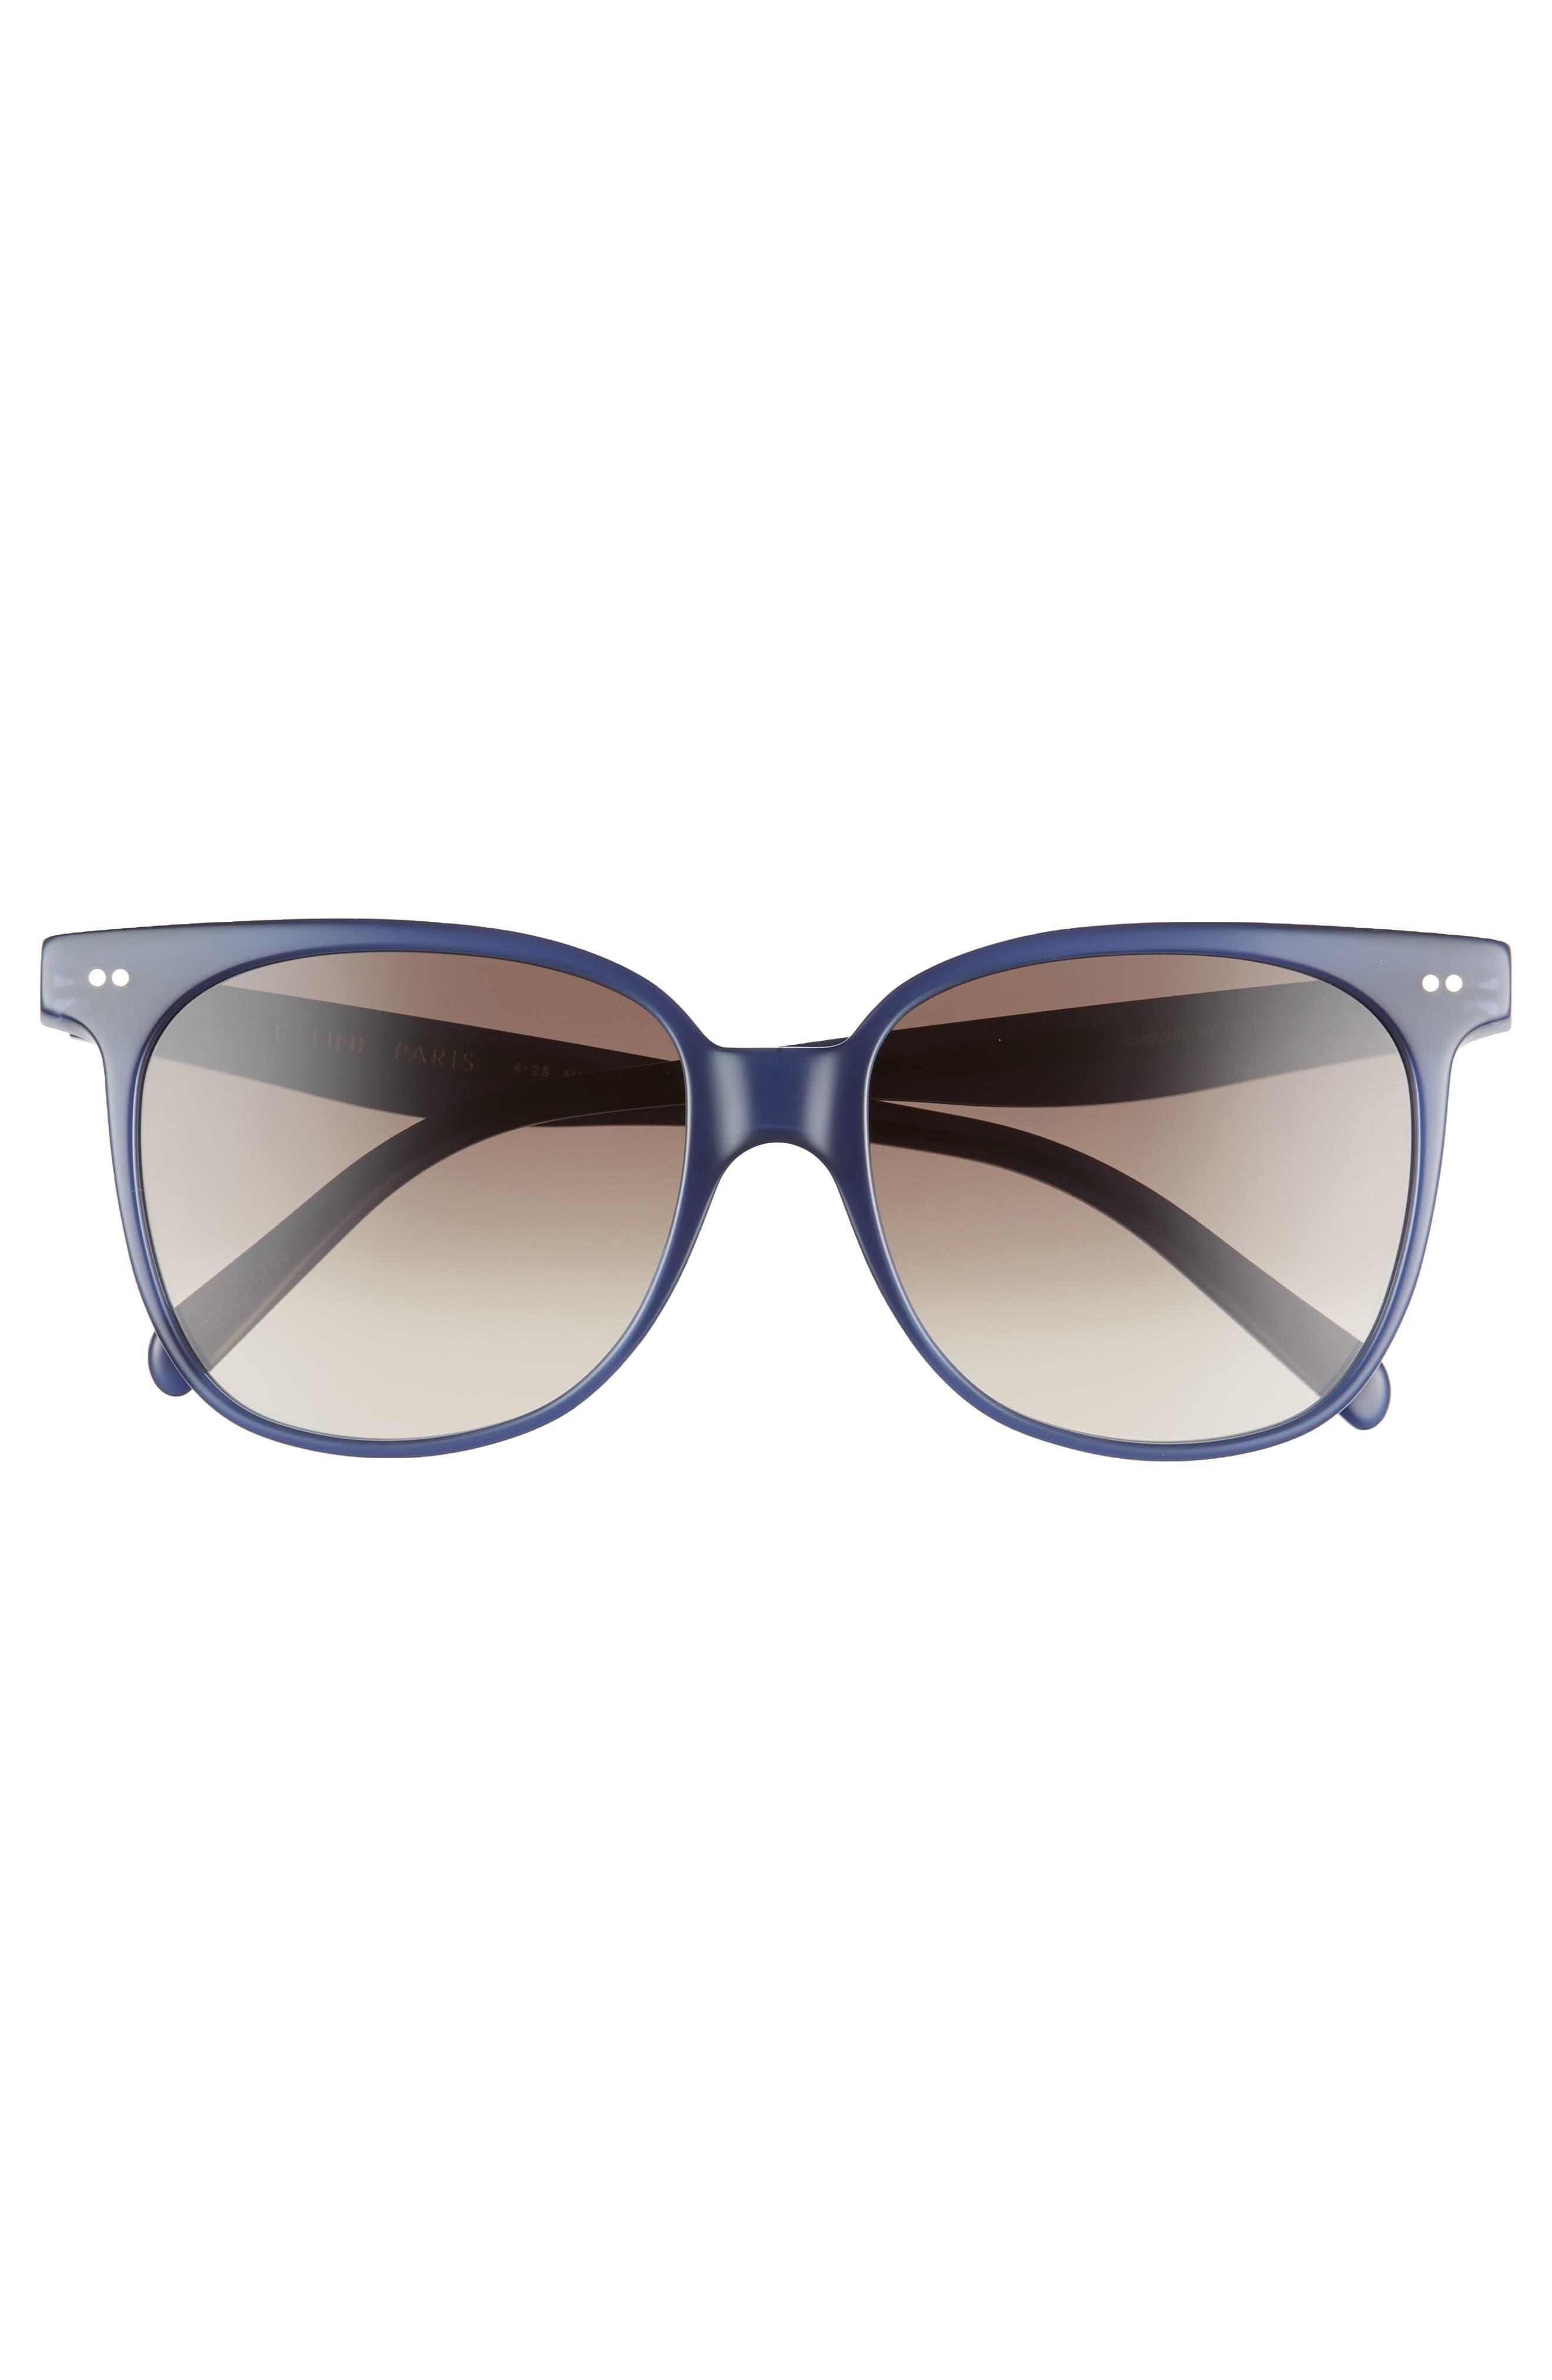 57mm Round Sunglasses,                             Alternate thumbnail 3, color,                             BLUE/ BROWN GRADIENT